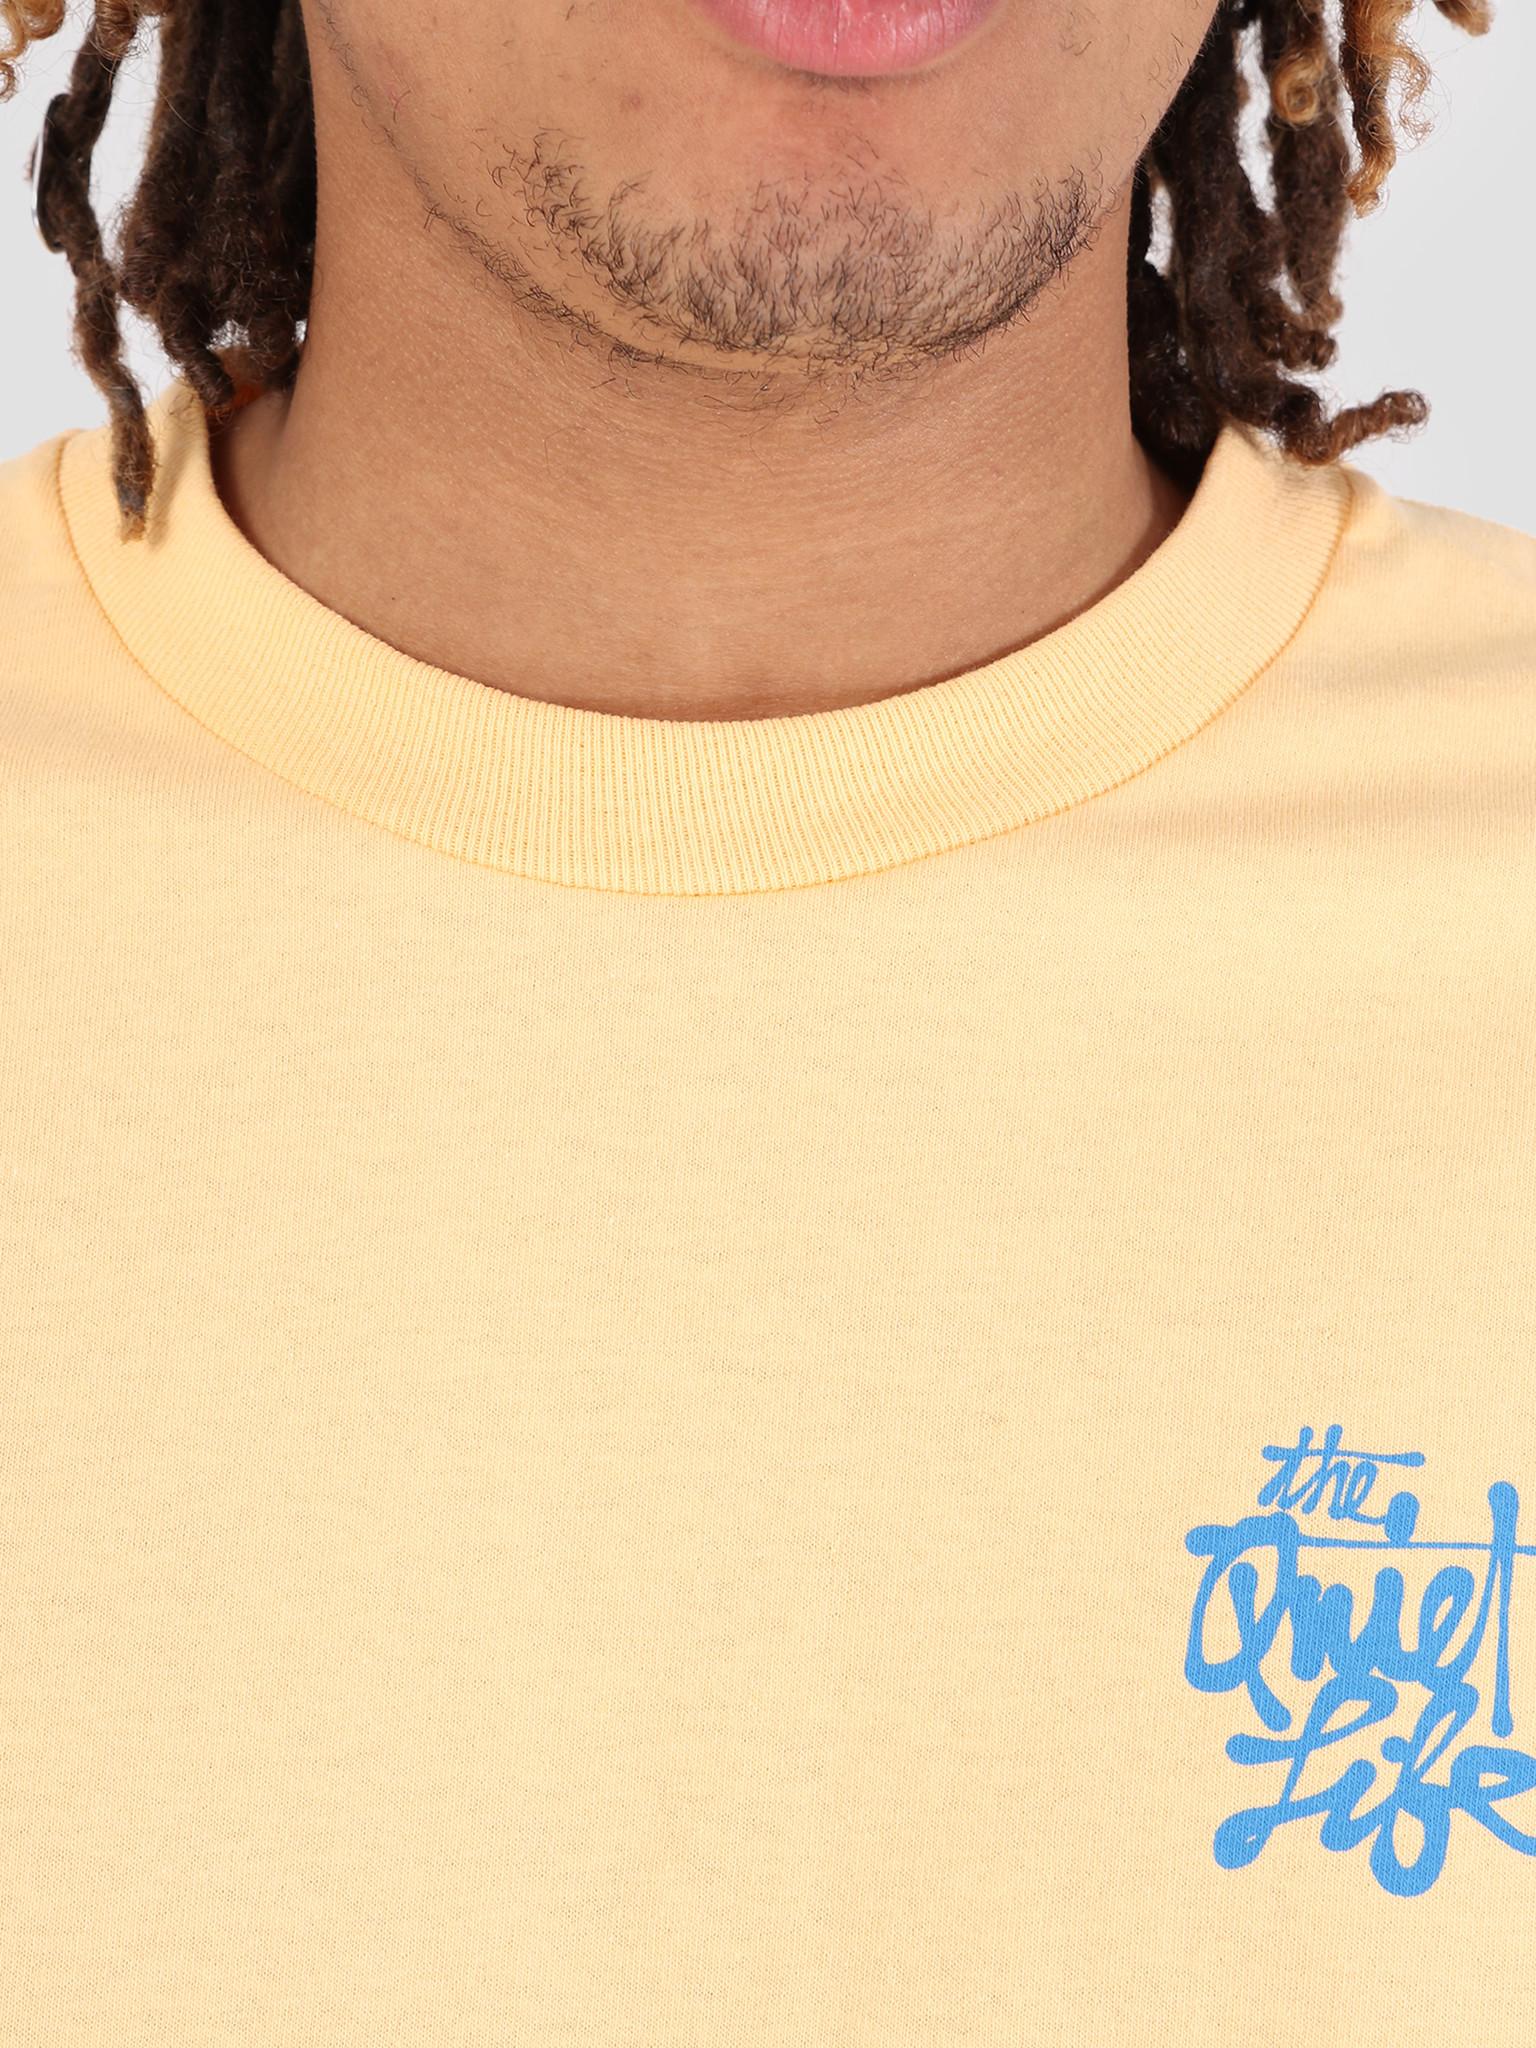 The Quiet Life The Quiet Life Cody Script T-Shirt Squash 19SPD1-1162-SQU